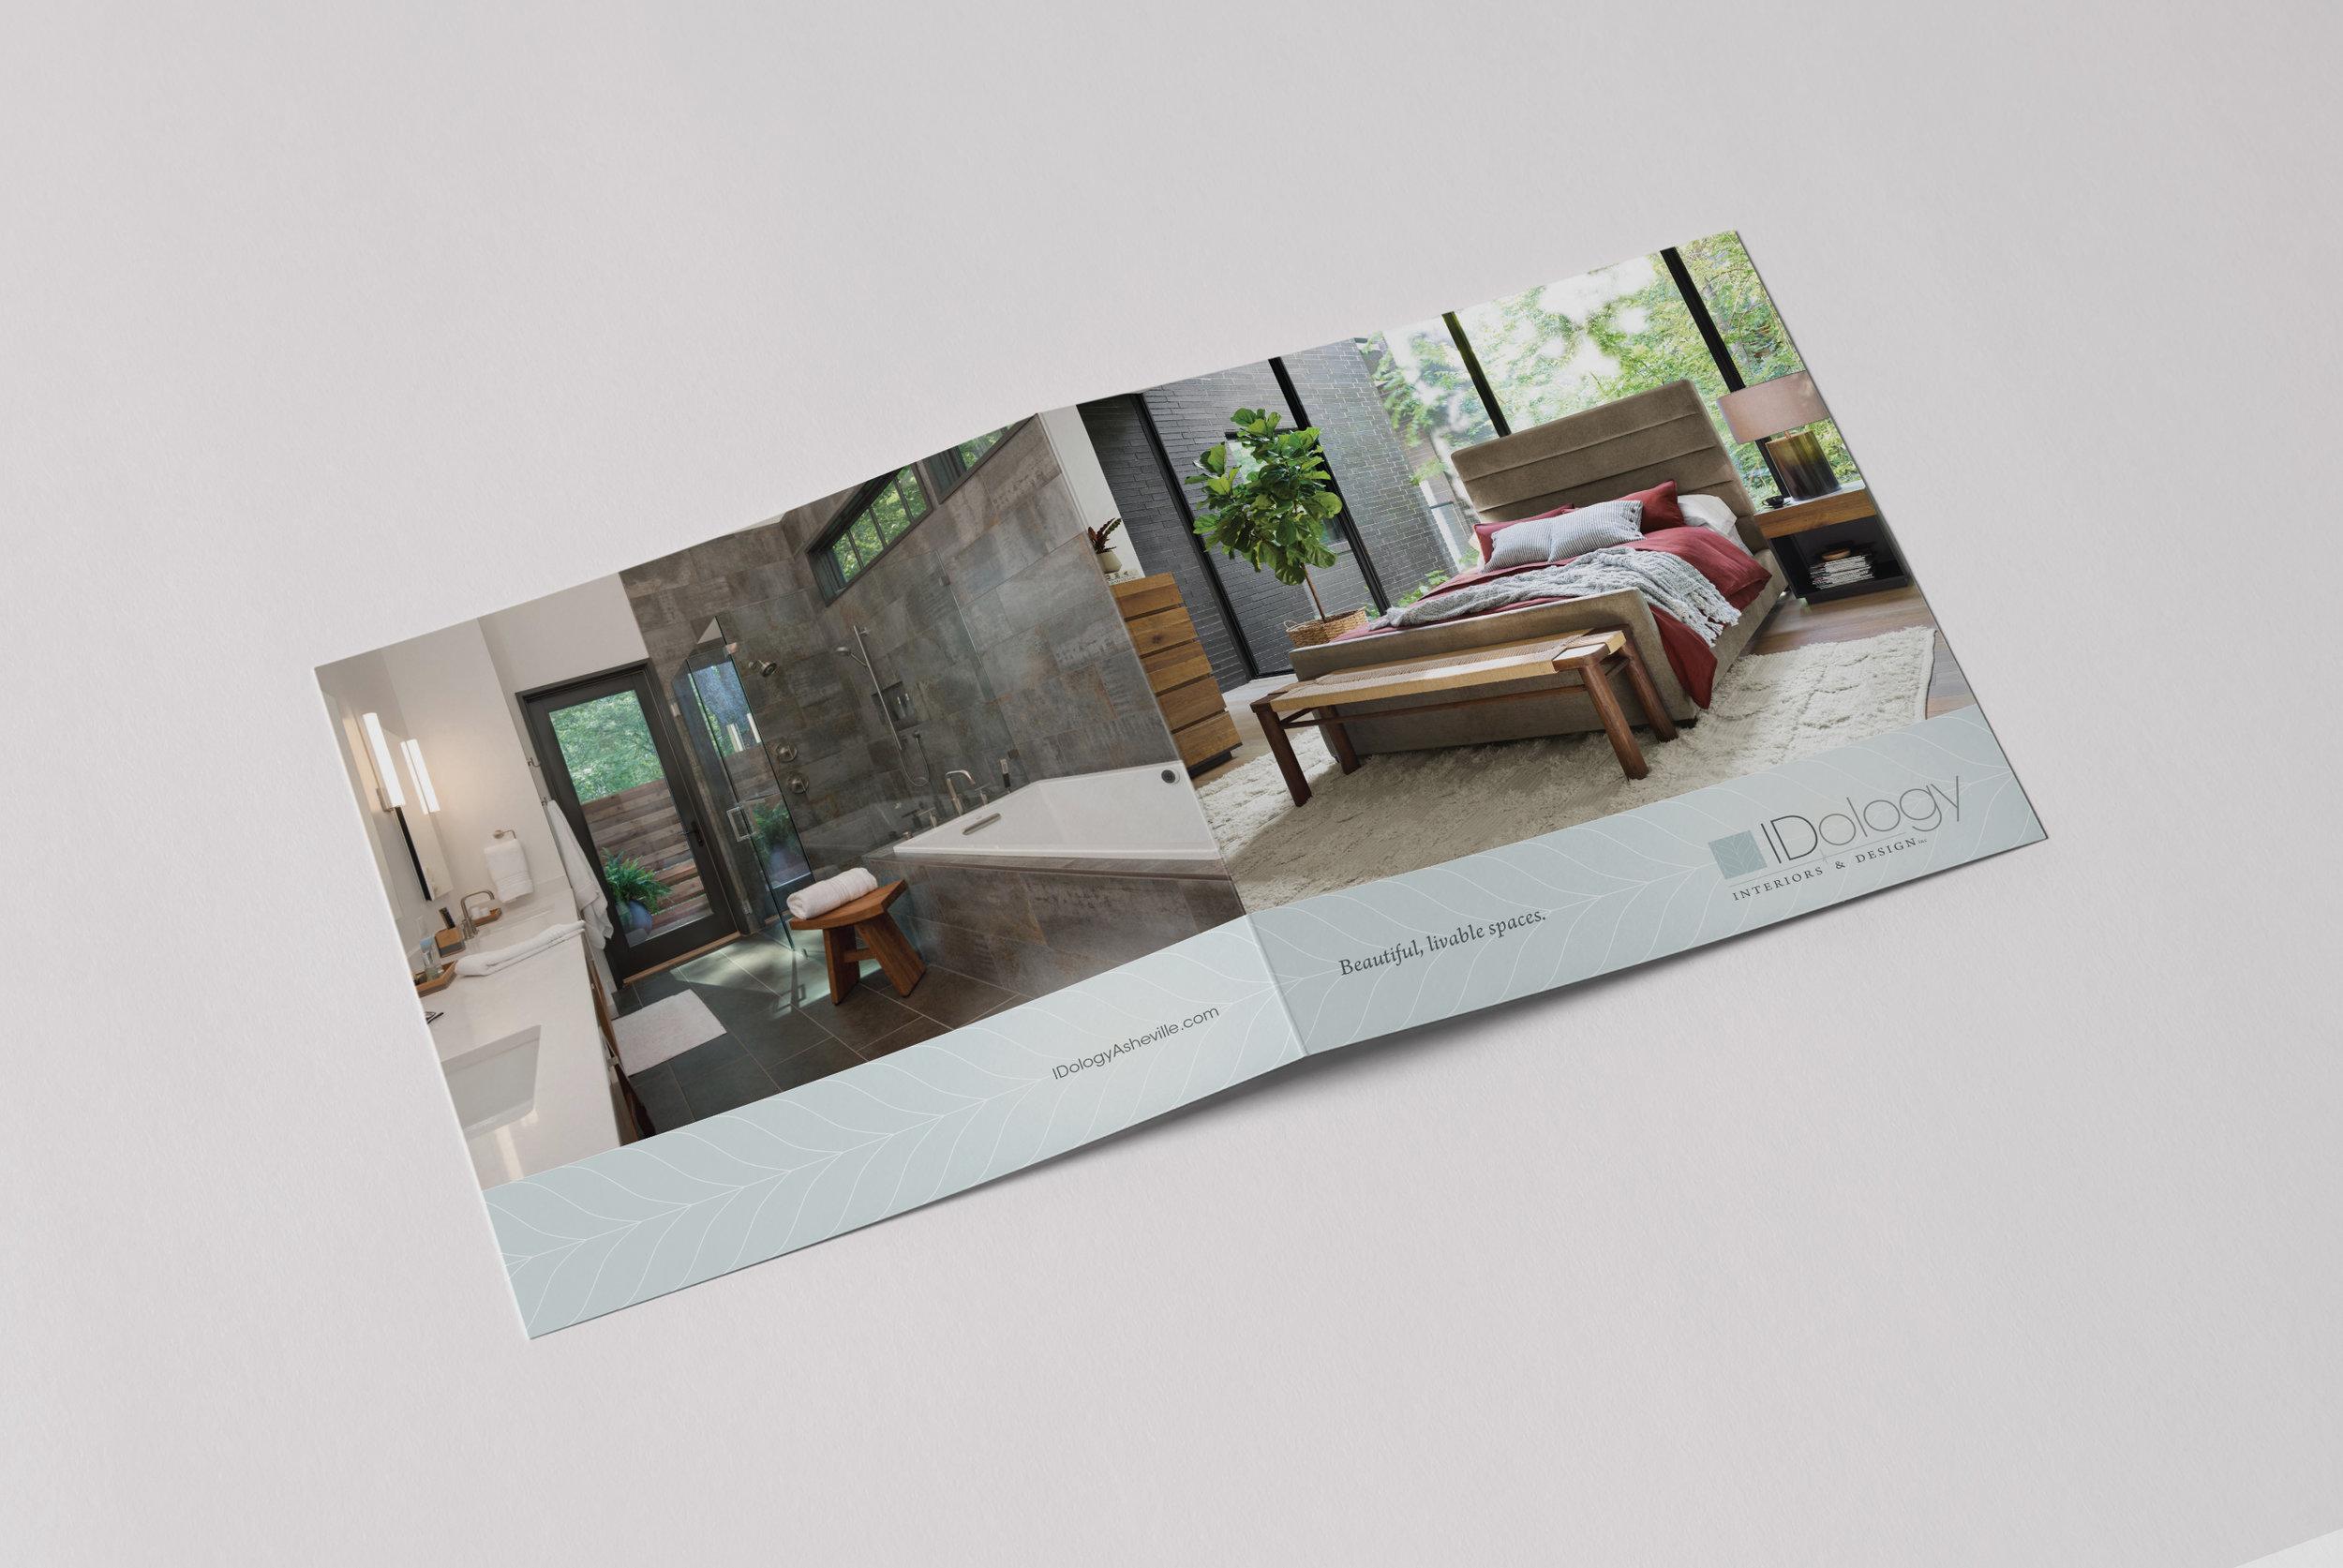 ID.ology_Square Brochure Mock-up2.jpg